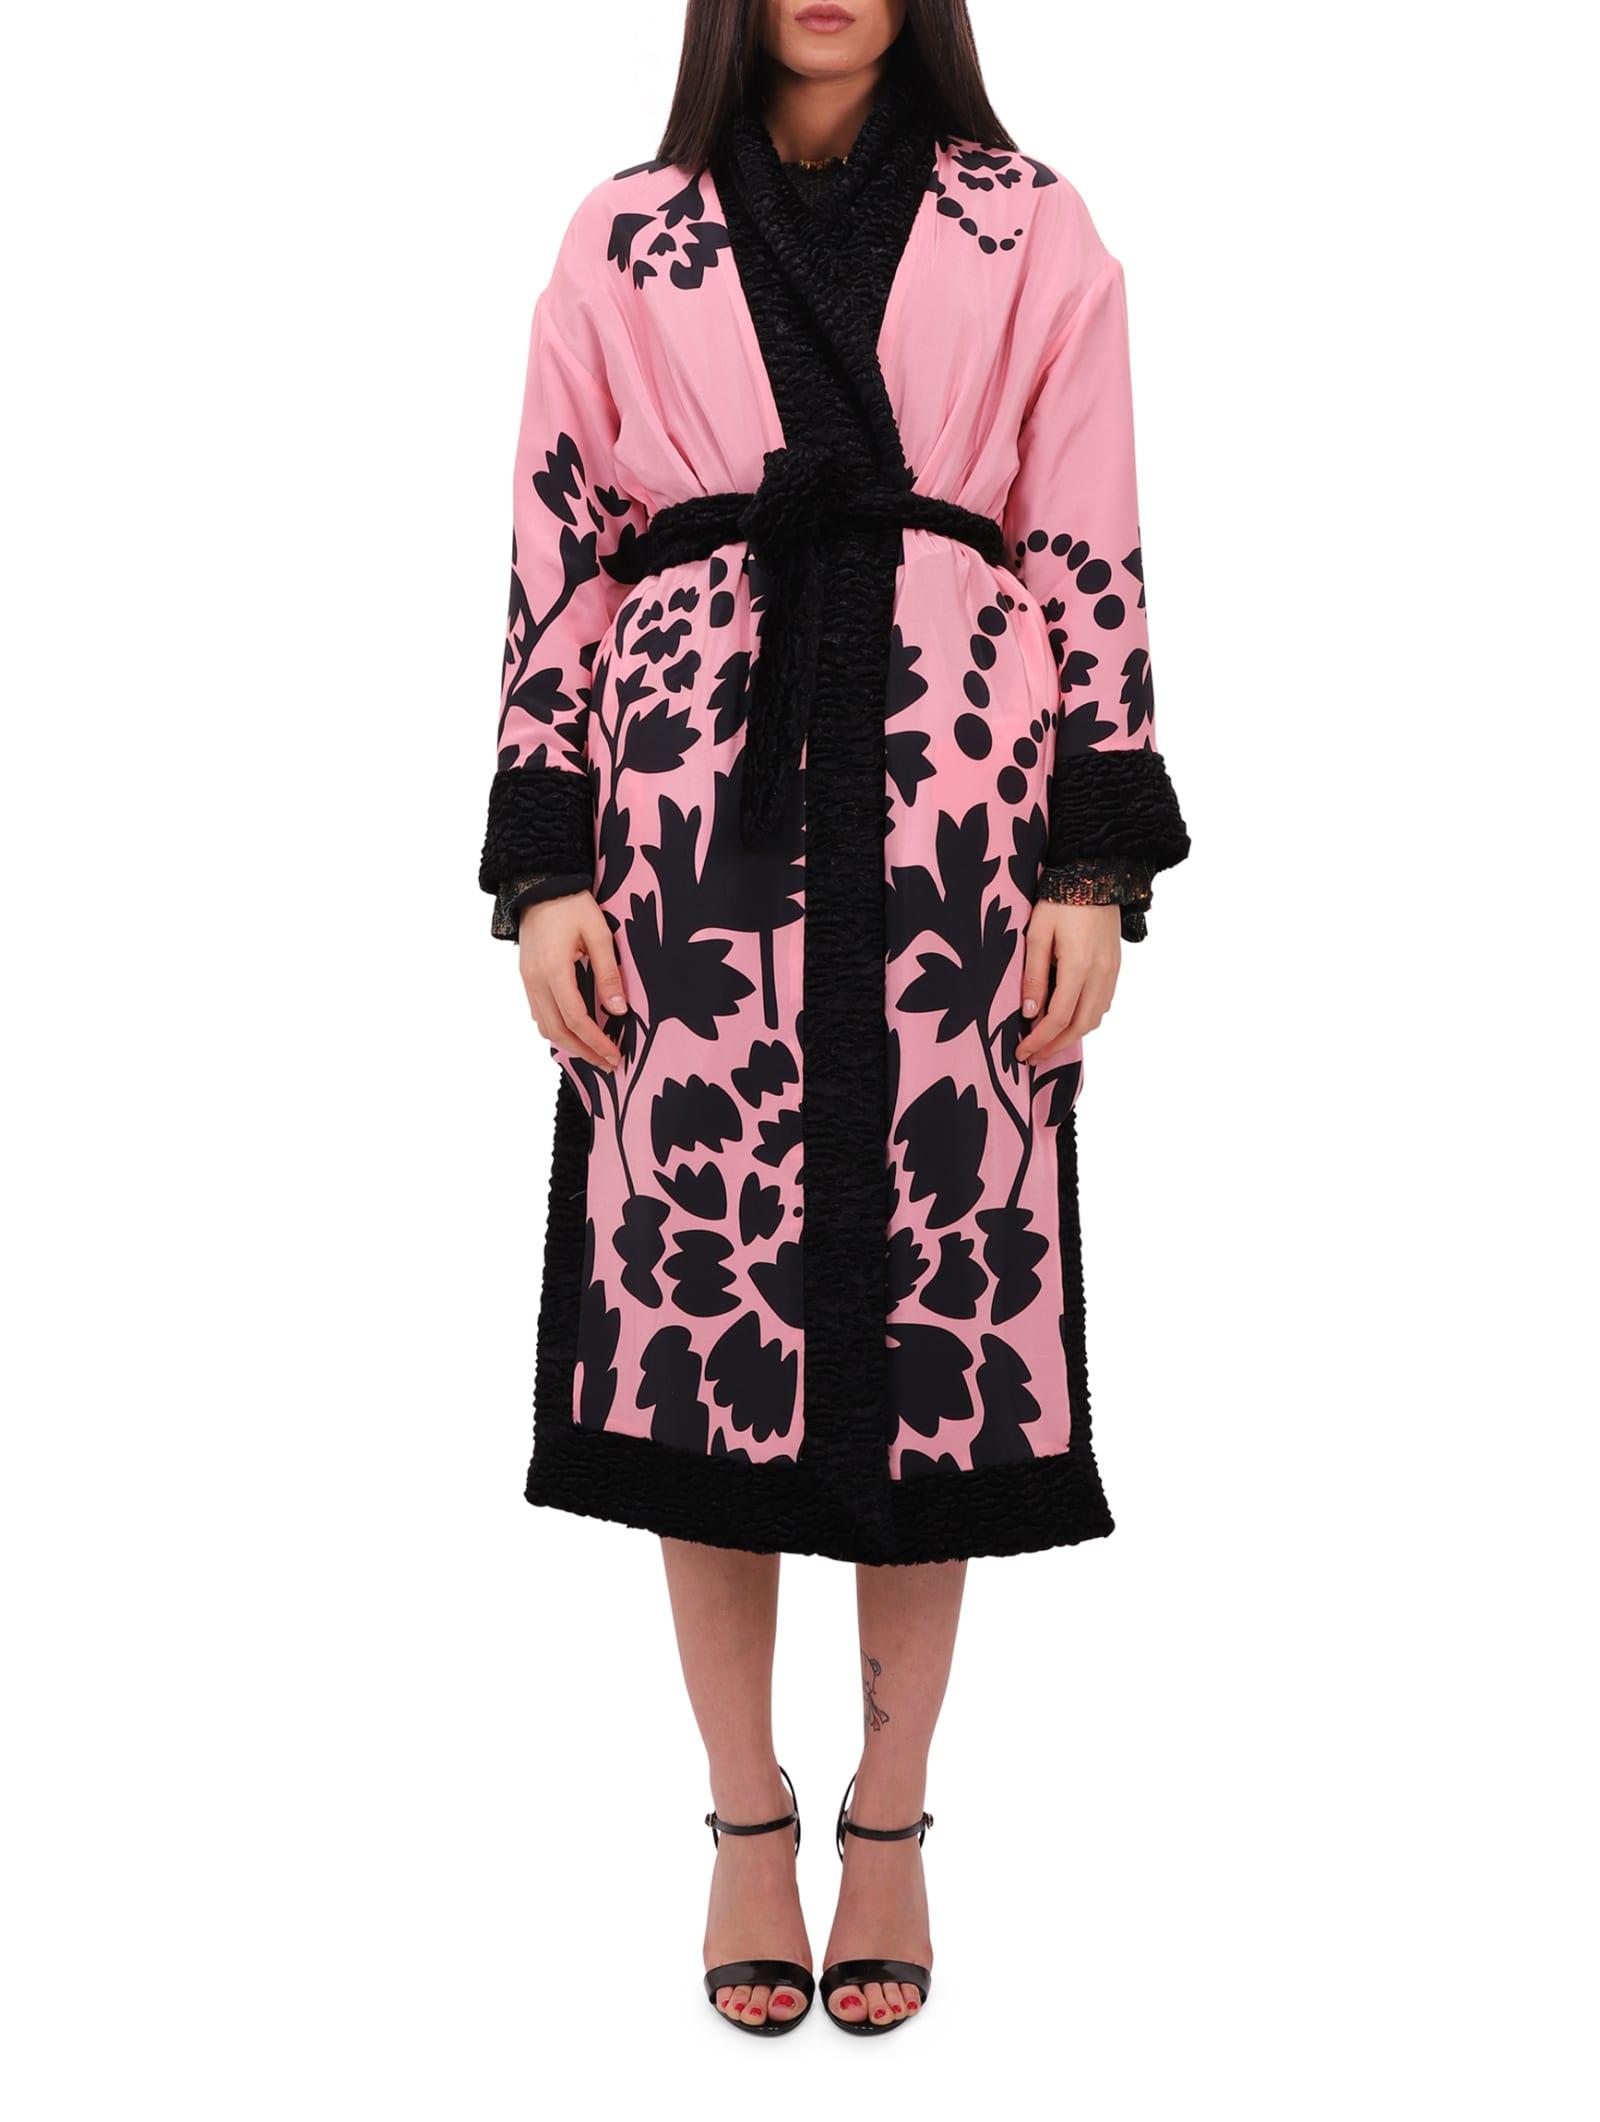 Marit Ilison Pink Coat